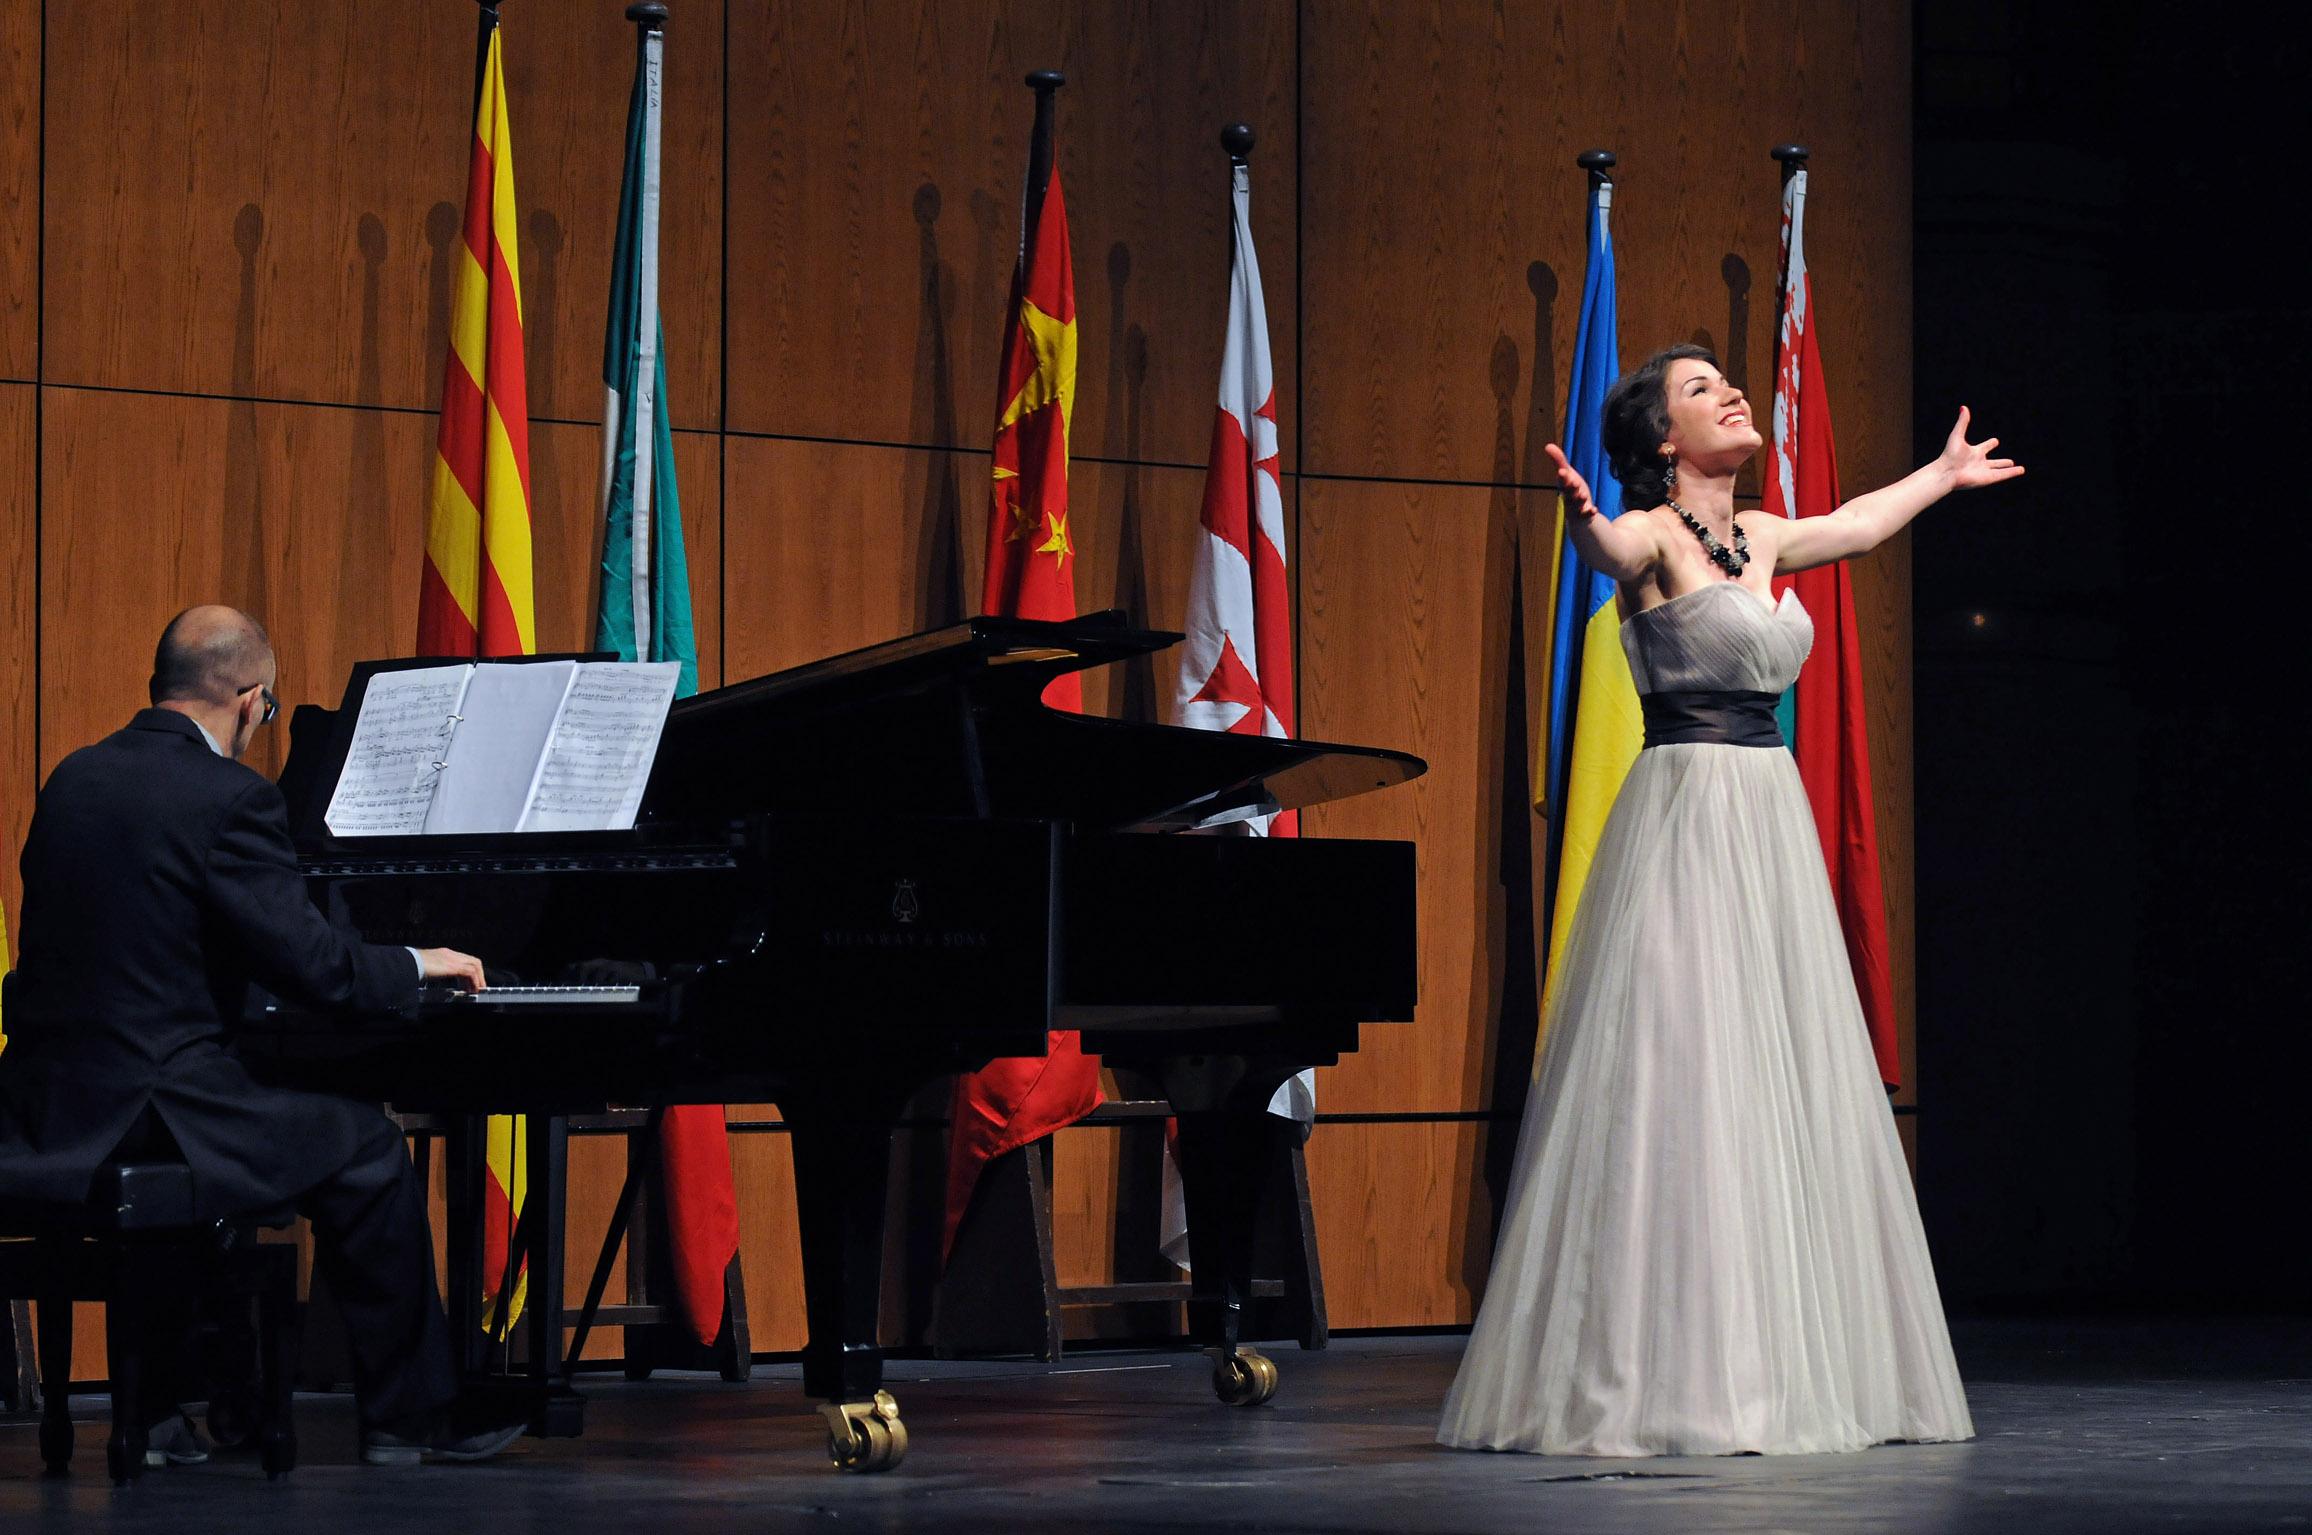 52è Concurs Internacional De Cant Francesc Viñas